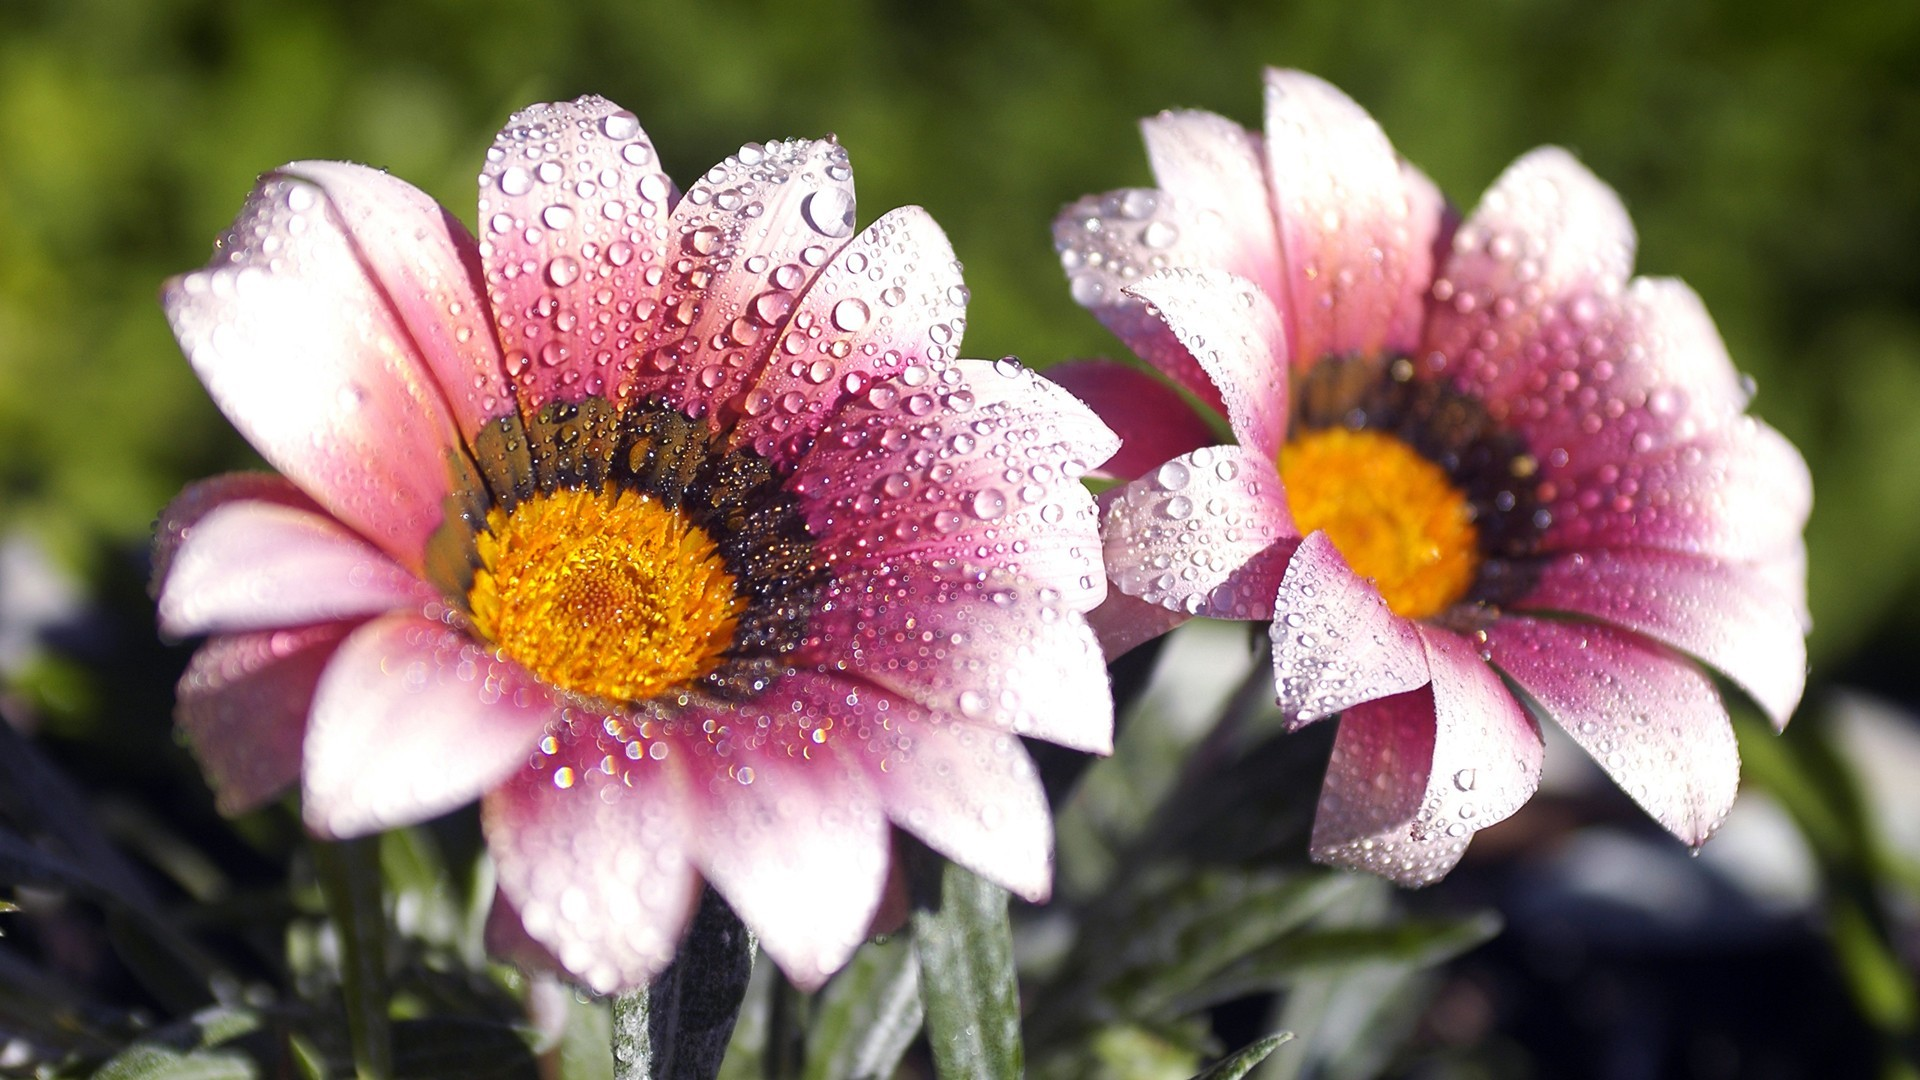 1920x1080, Beautiful Flowers Wallpapers For Desktop - All Flowers Image Download Hd - HD Wallpaper